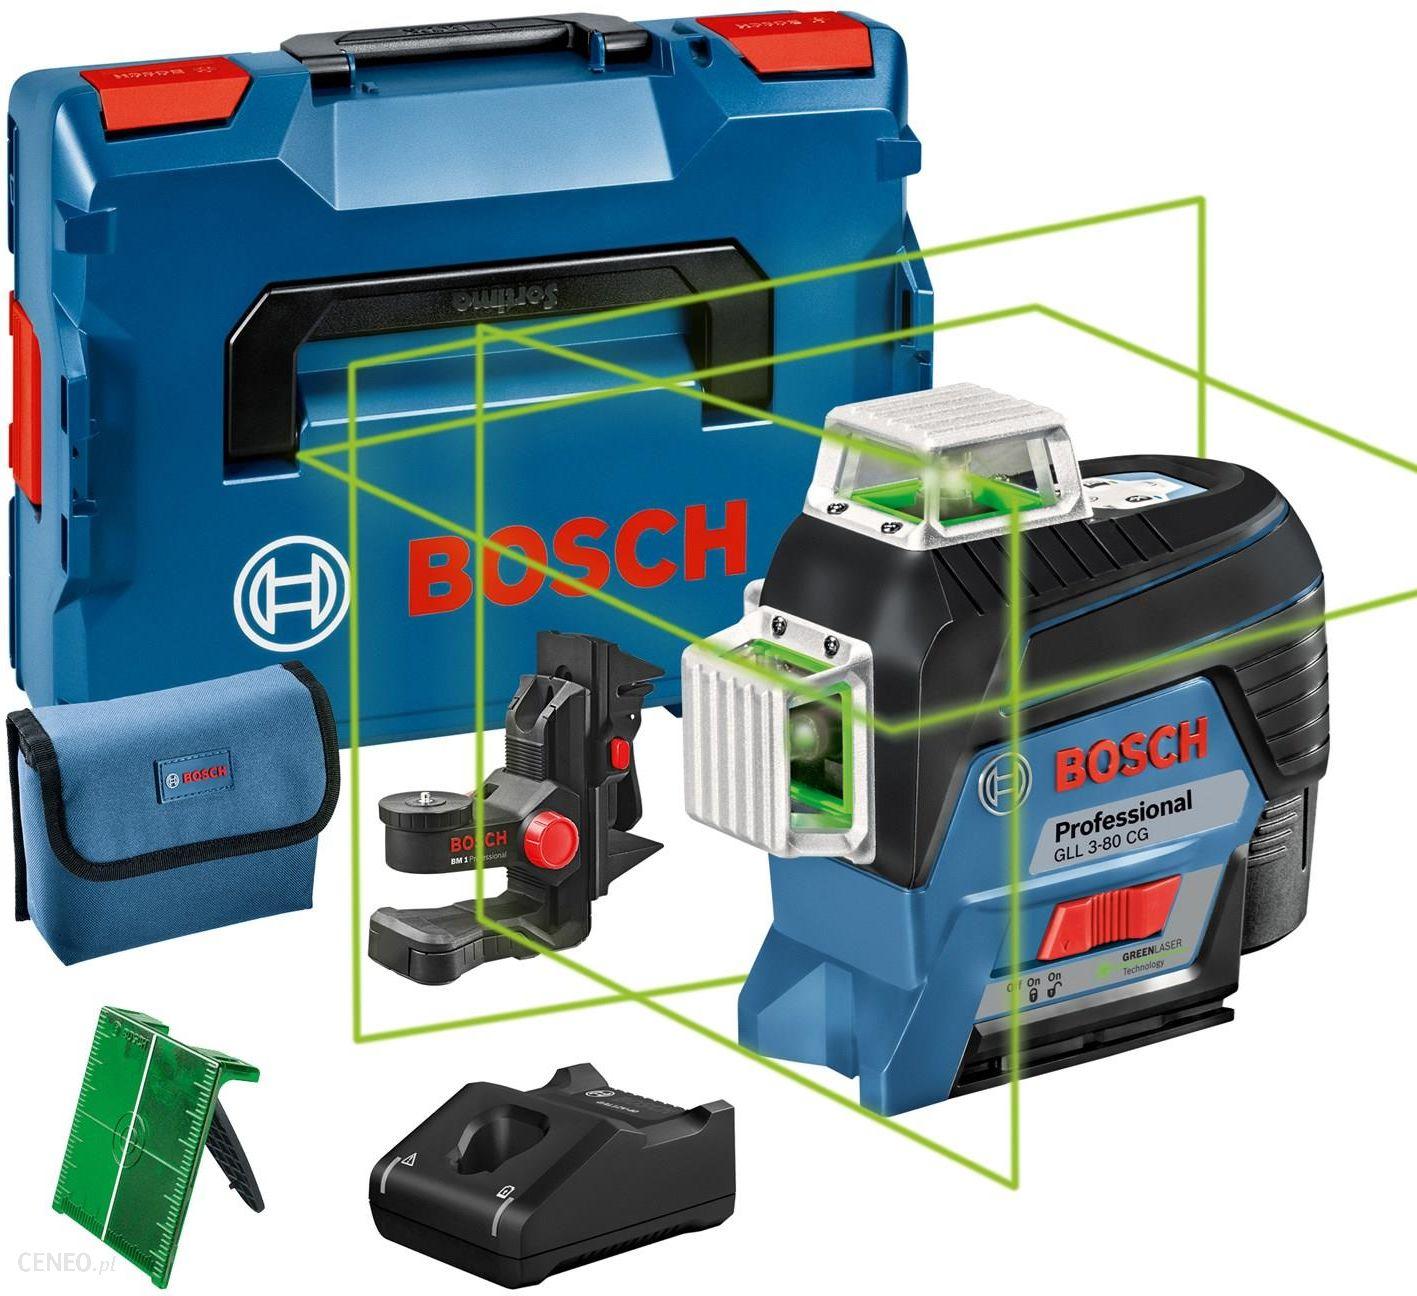 Bosch Gll 3-80 Cg + Bm1 + L-Boxx 0601063T00